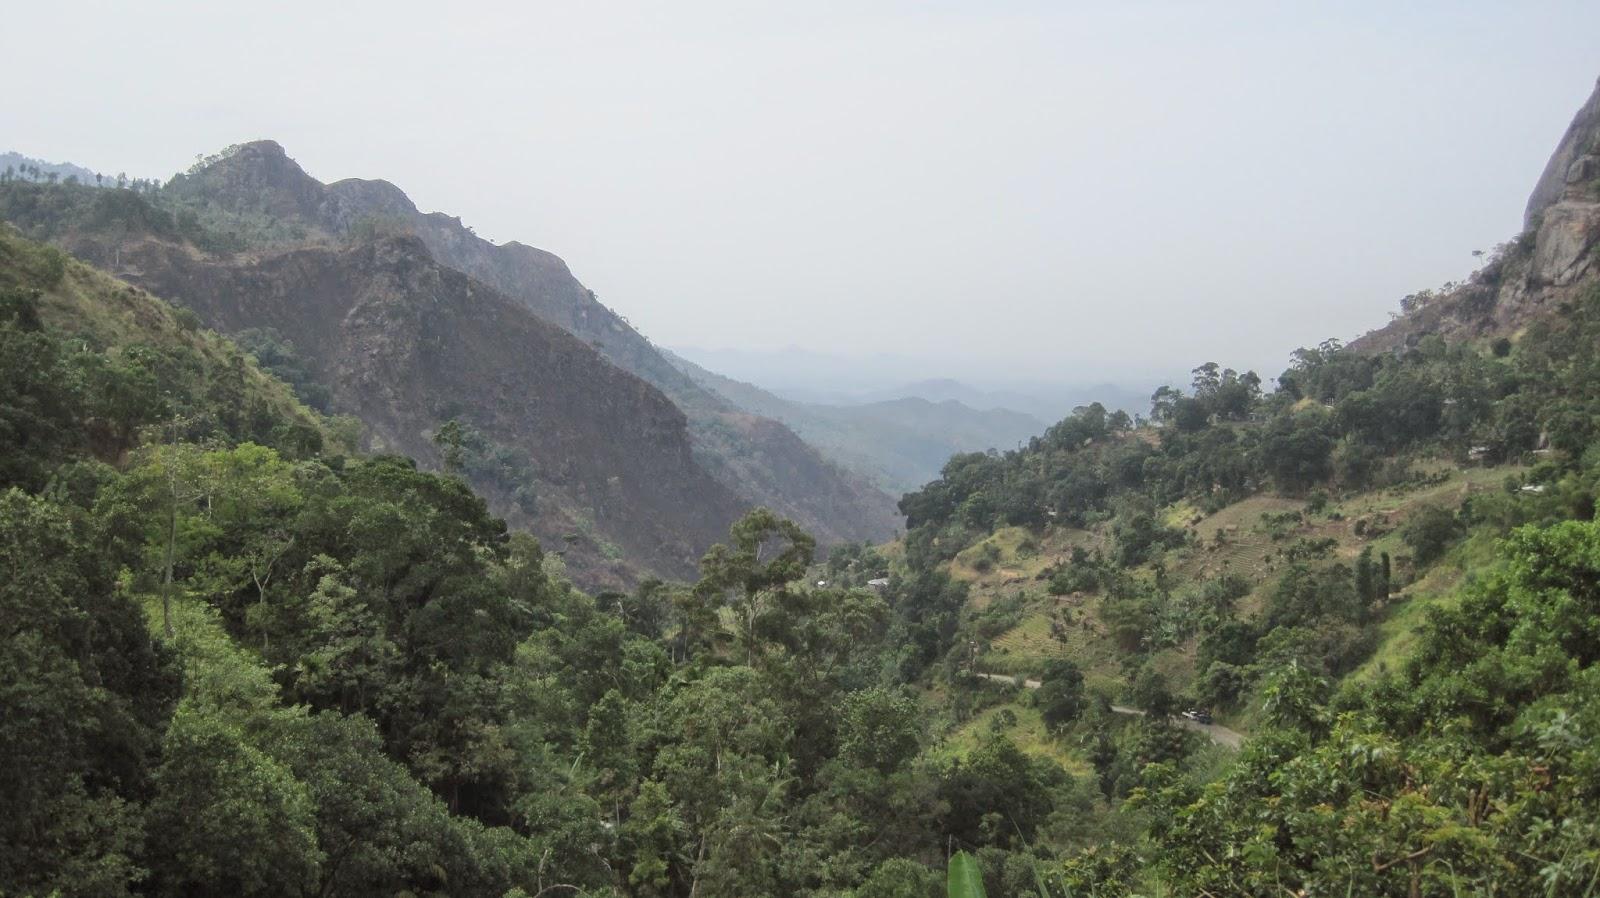 Hill Country (Sri Lanka)